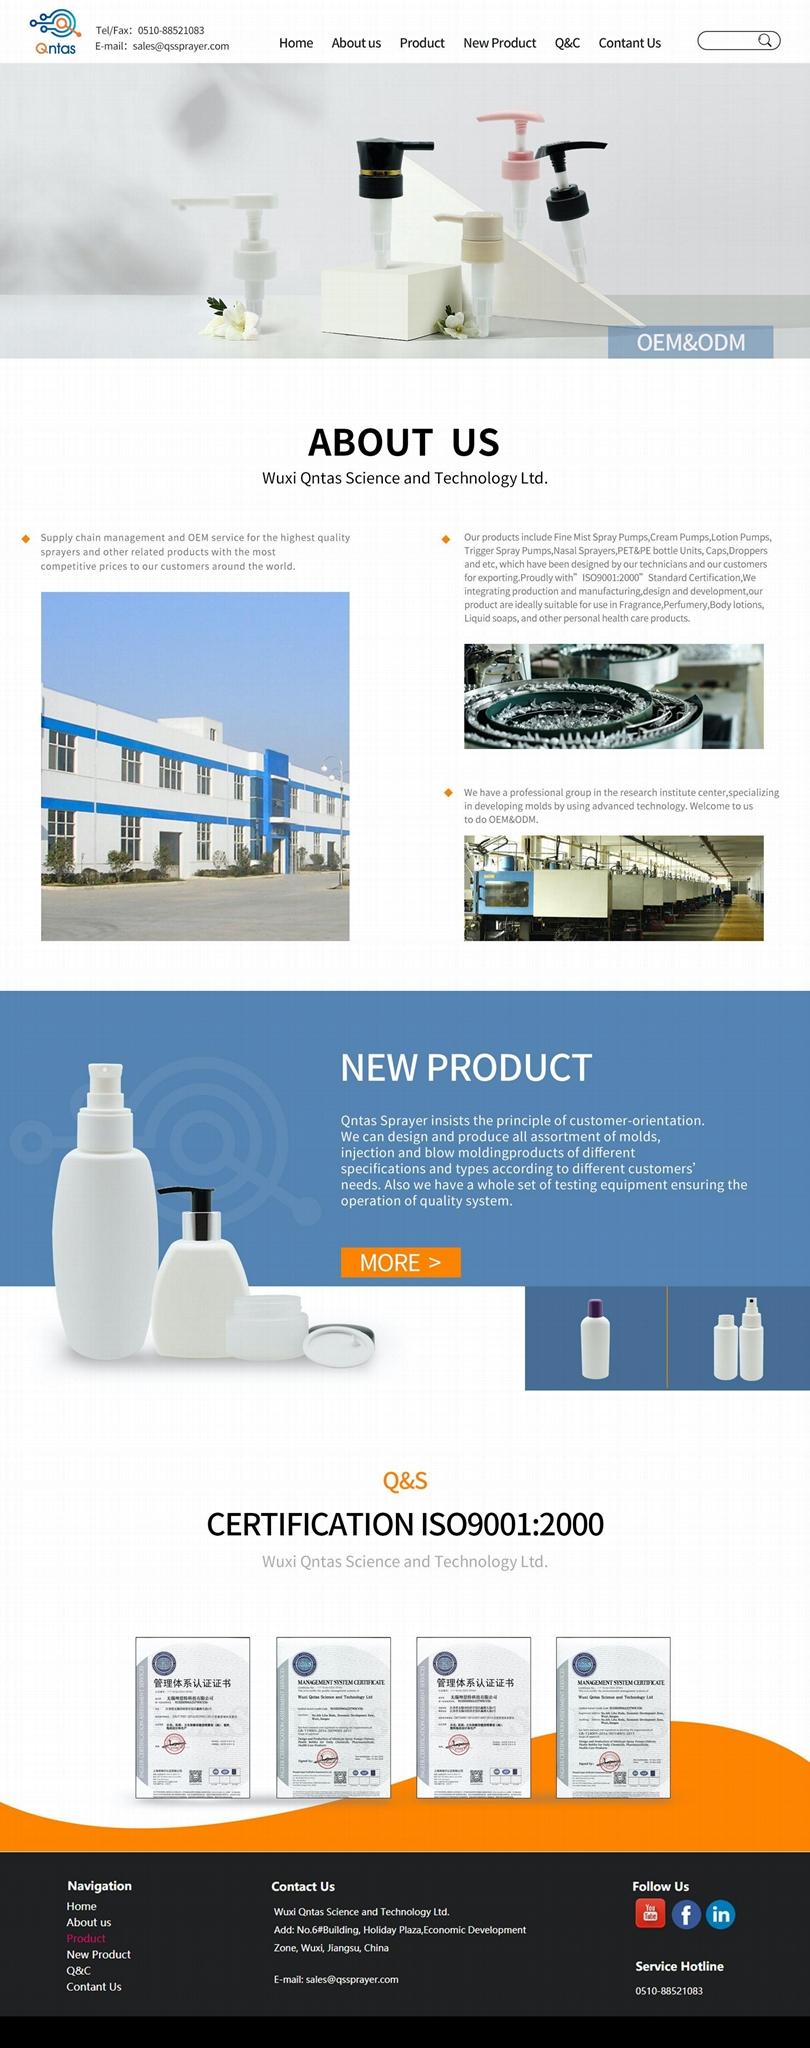 Cream pump sprayer CR-01 42400 C23N 0.4ML 2